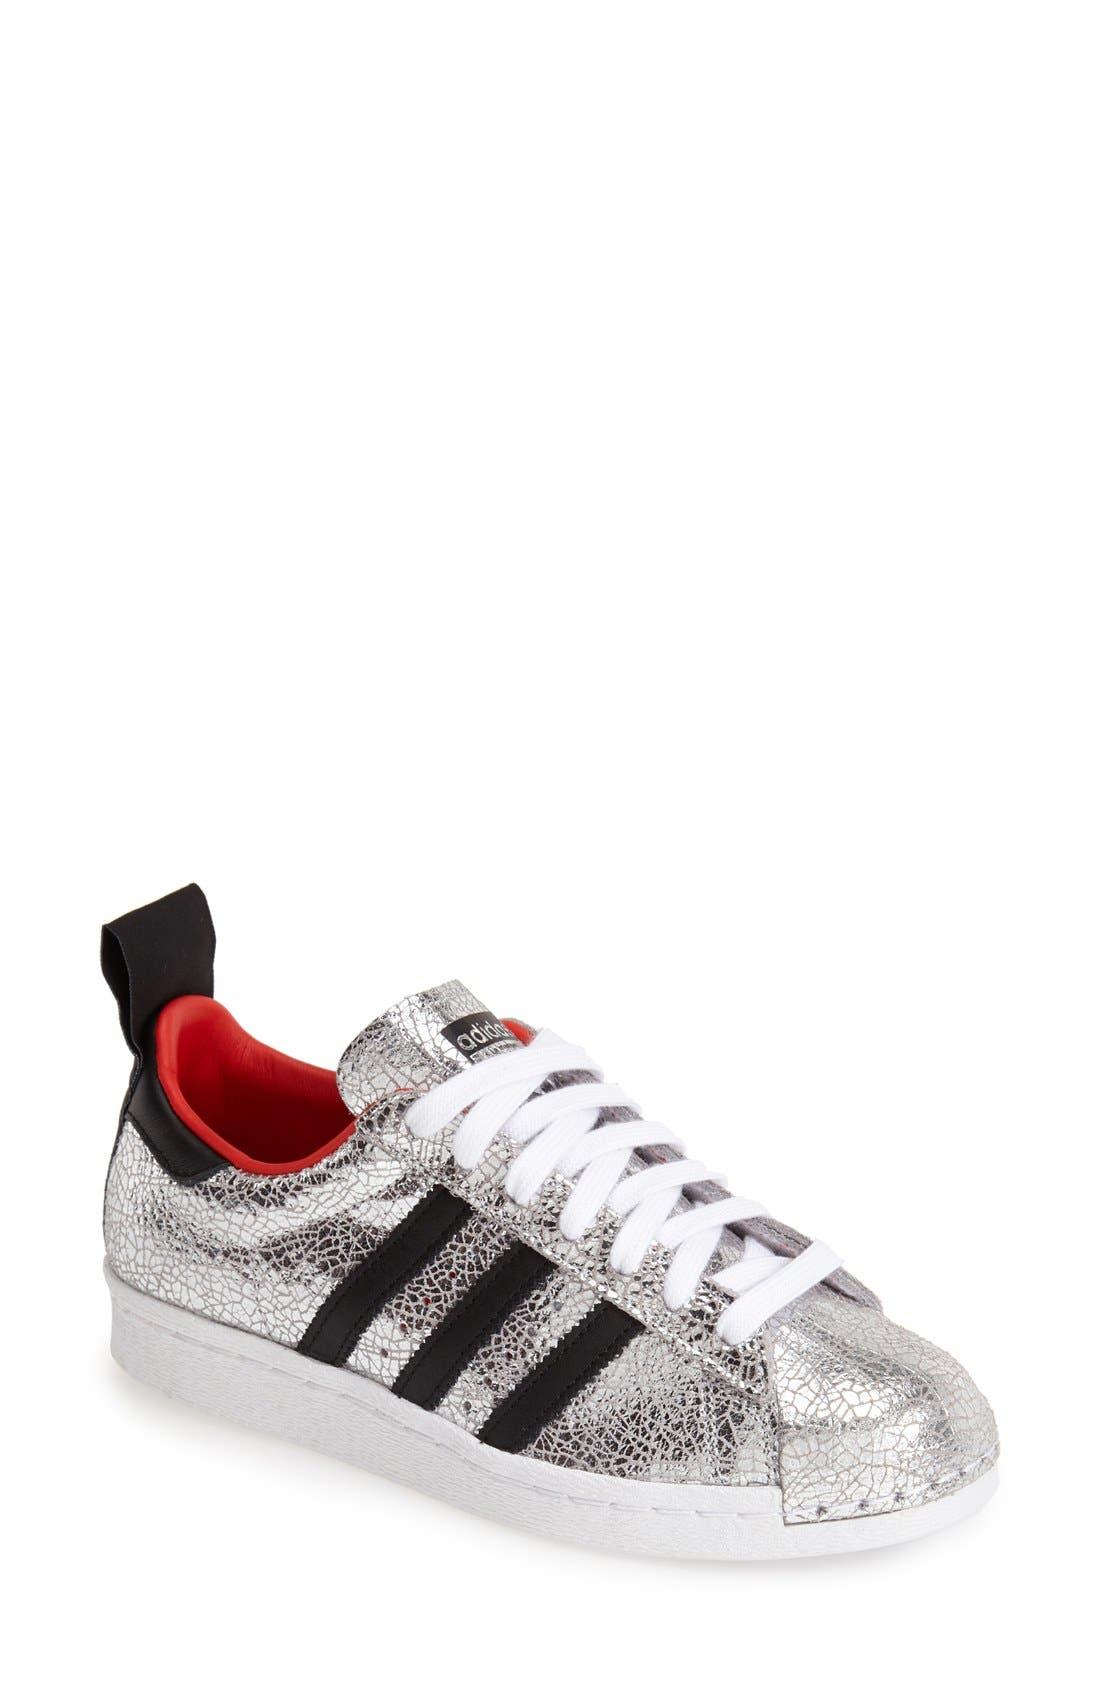 Alternate Image 1 Selected - Topshop for adidas Originals '80s Premium Superstar' Sneaker (Women)